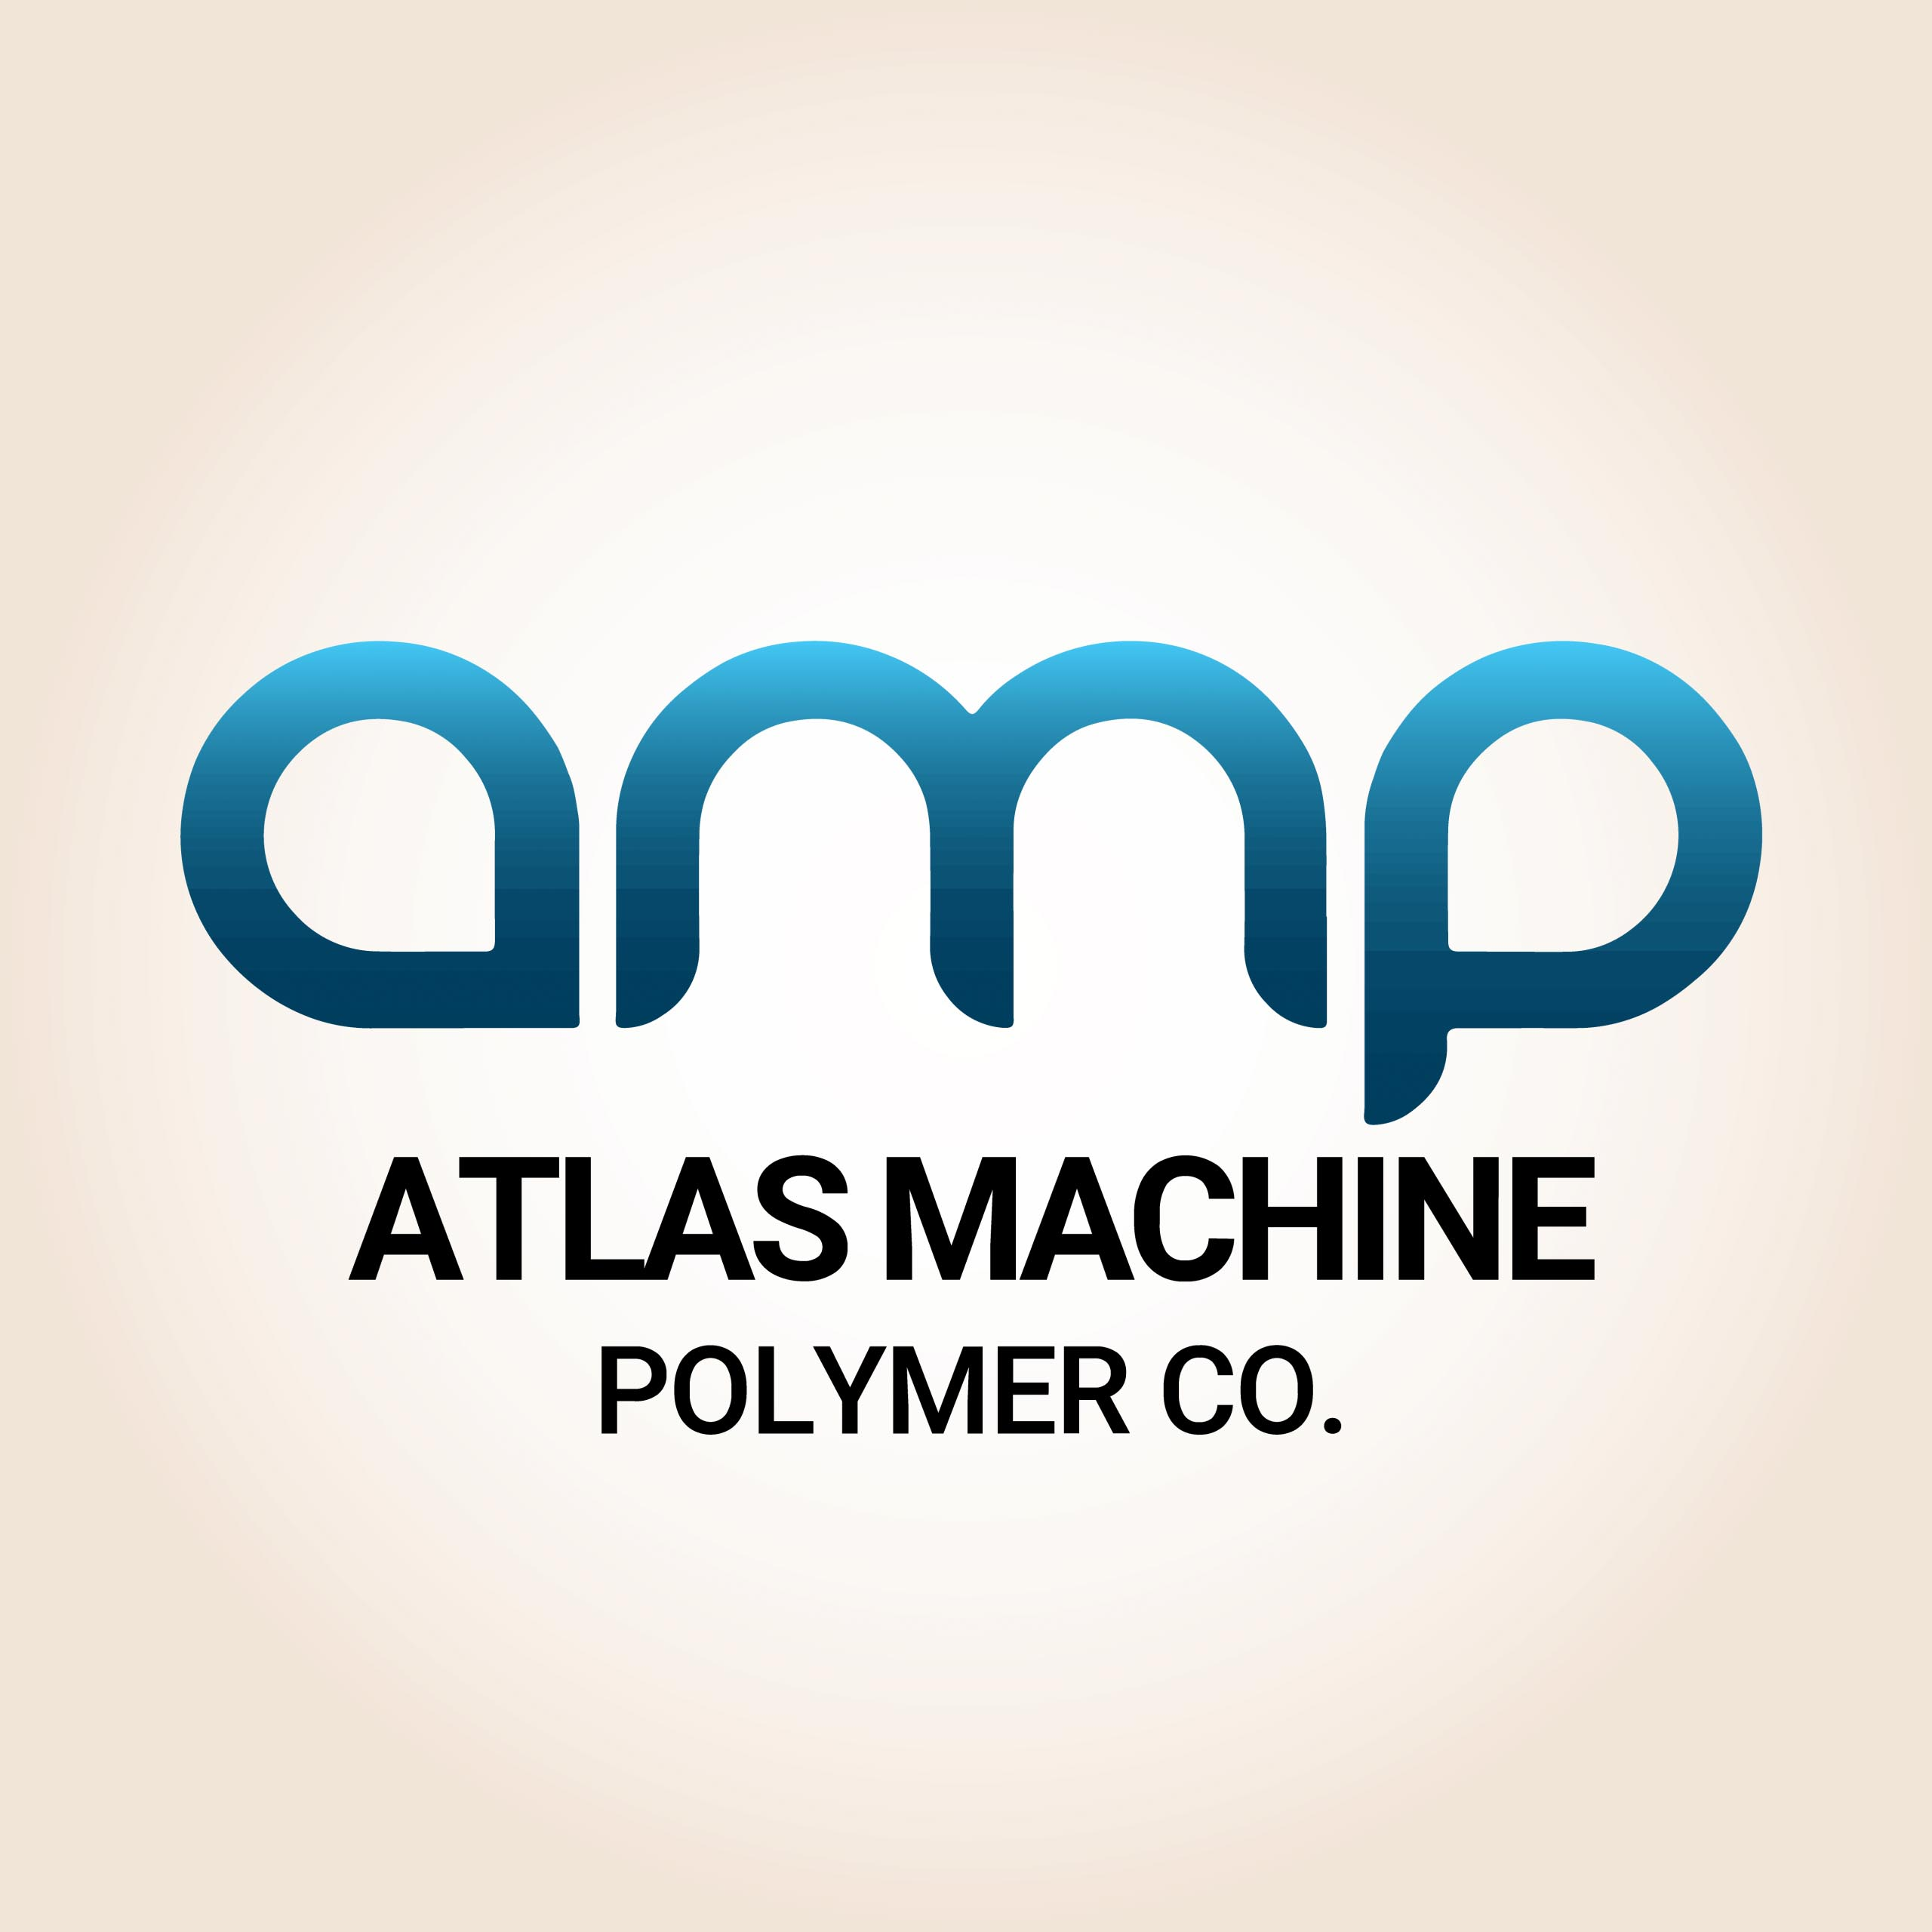 اطلس ماشین پلیمر | عکاسی صنعتی | عکاسی تبلیغاتی از محصولات Atlas Machine